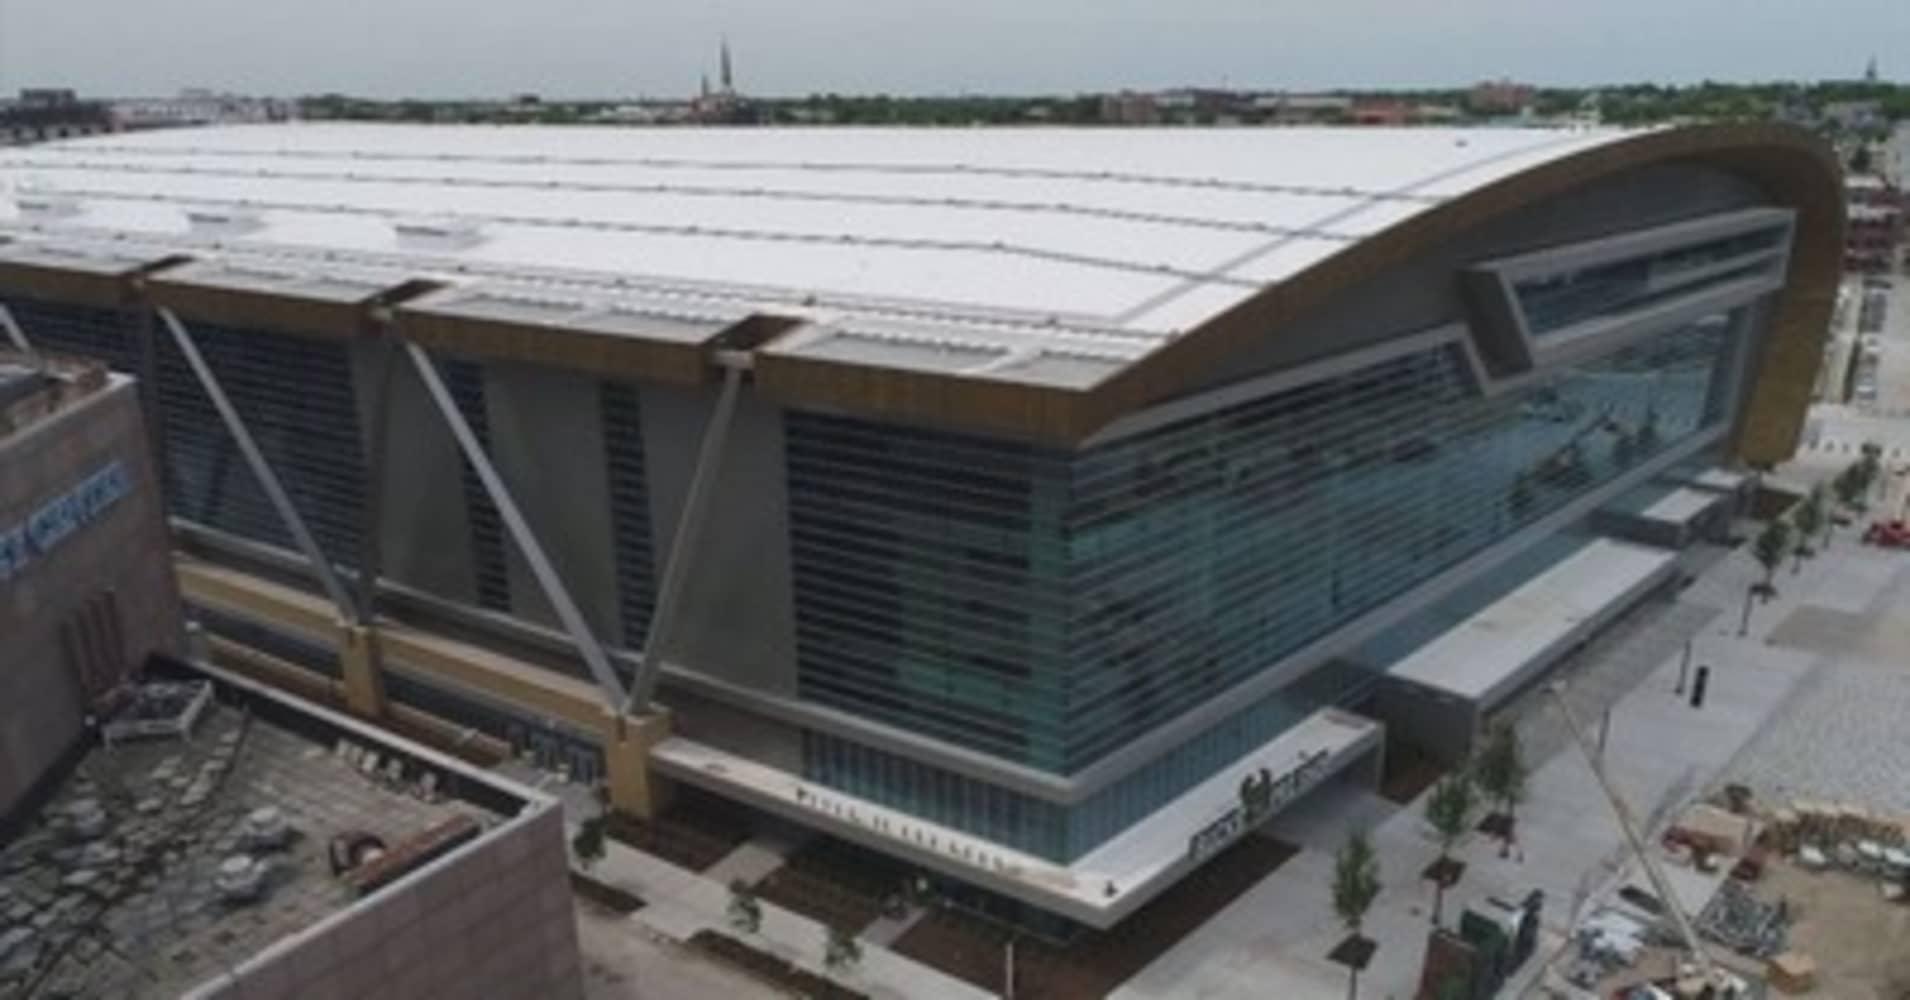 Fiserv Forum the new home of the Milwaukee Bucks